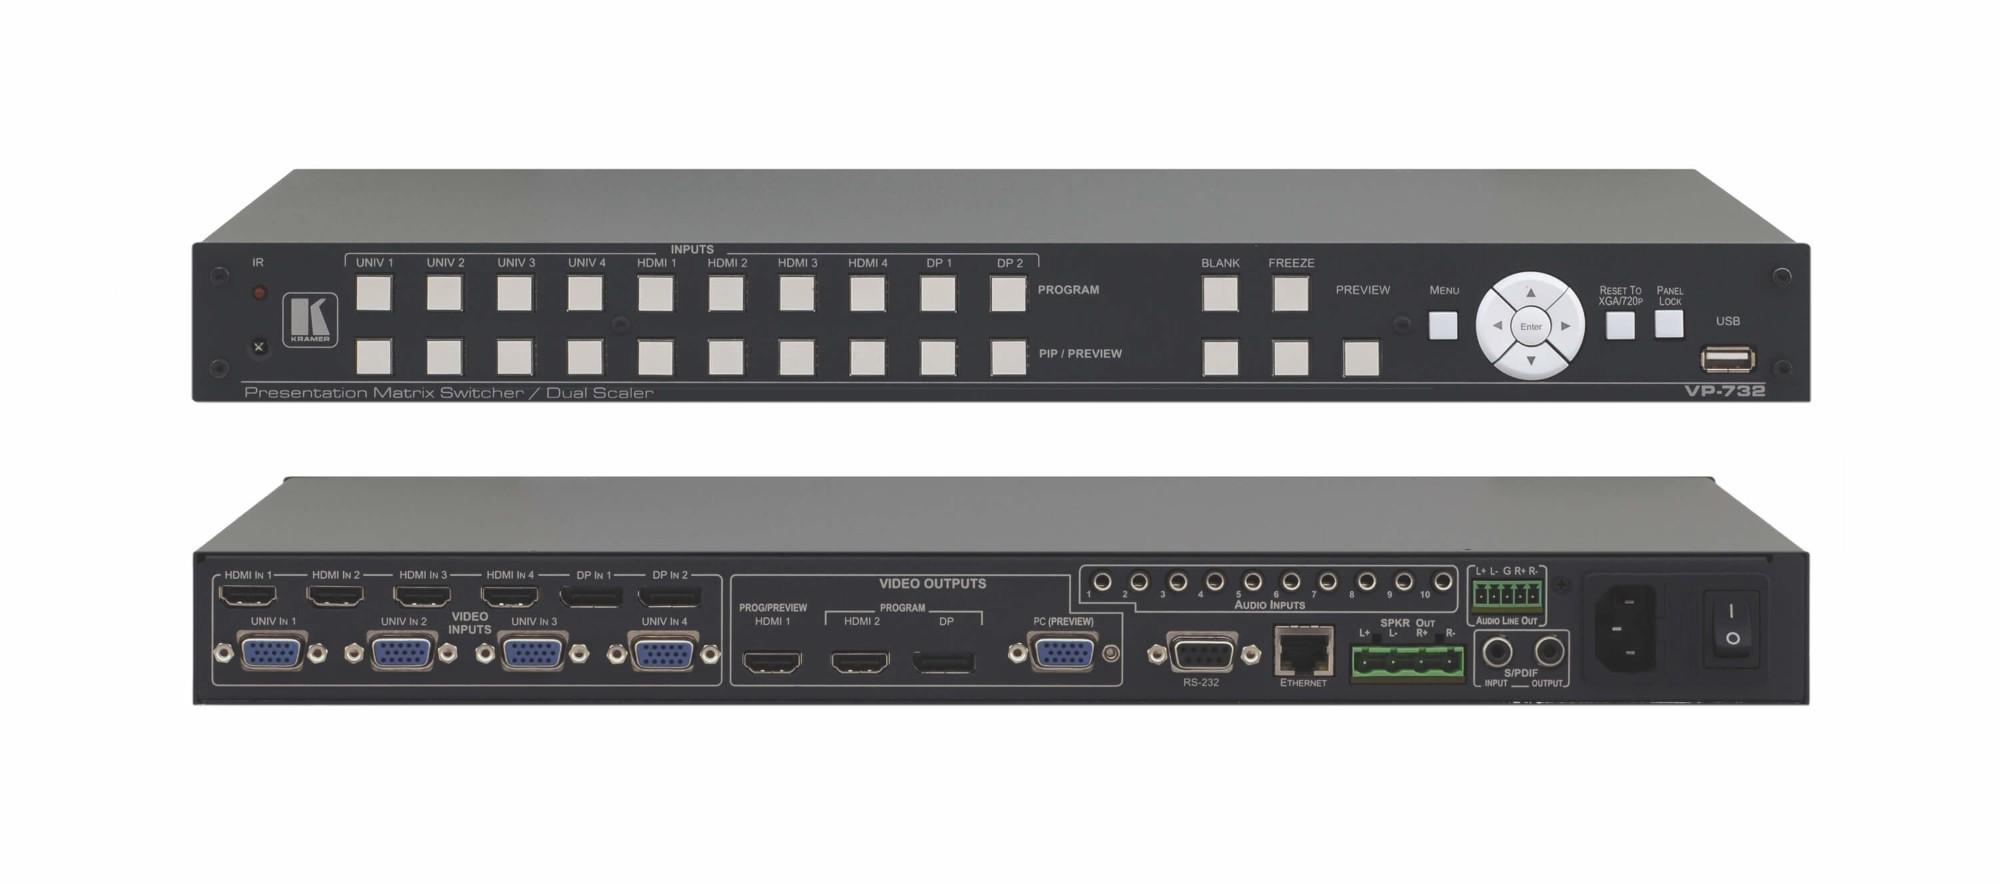 Kramer Electronics VP-732 HDMI video switch